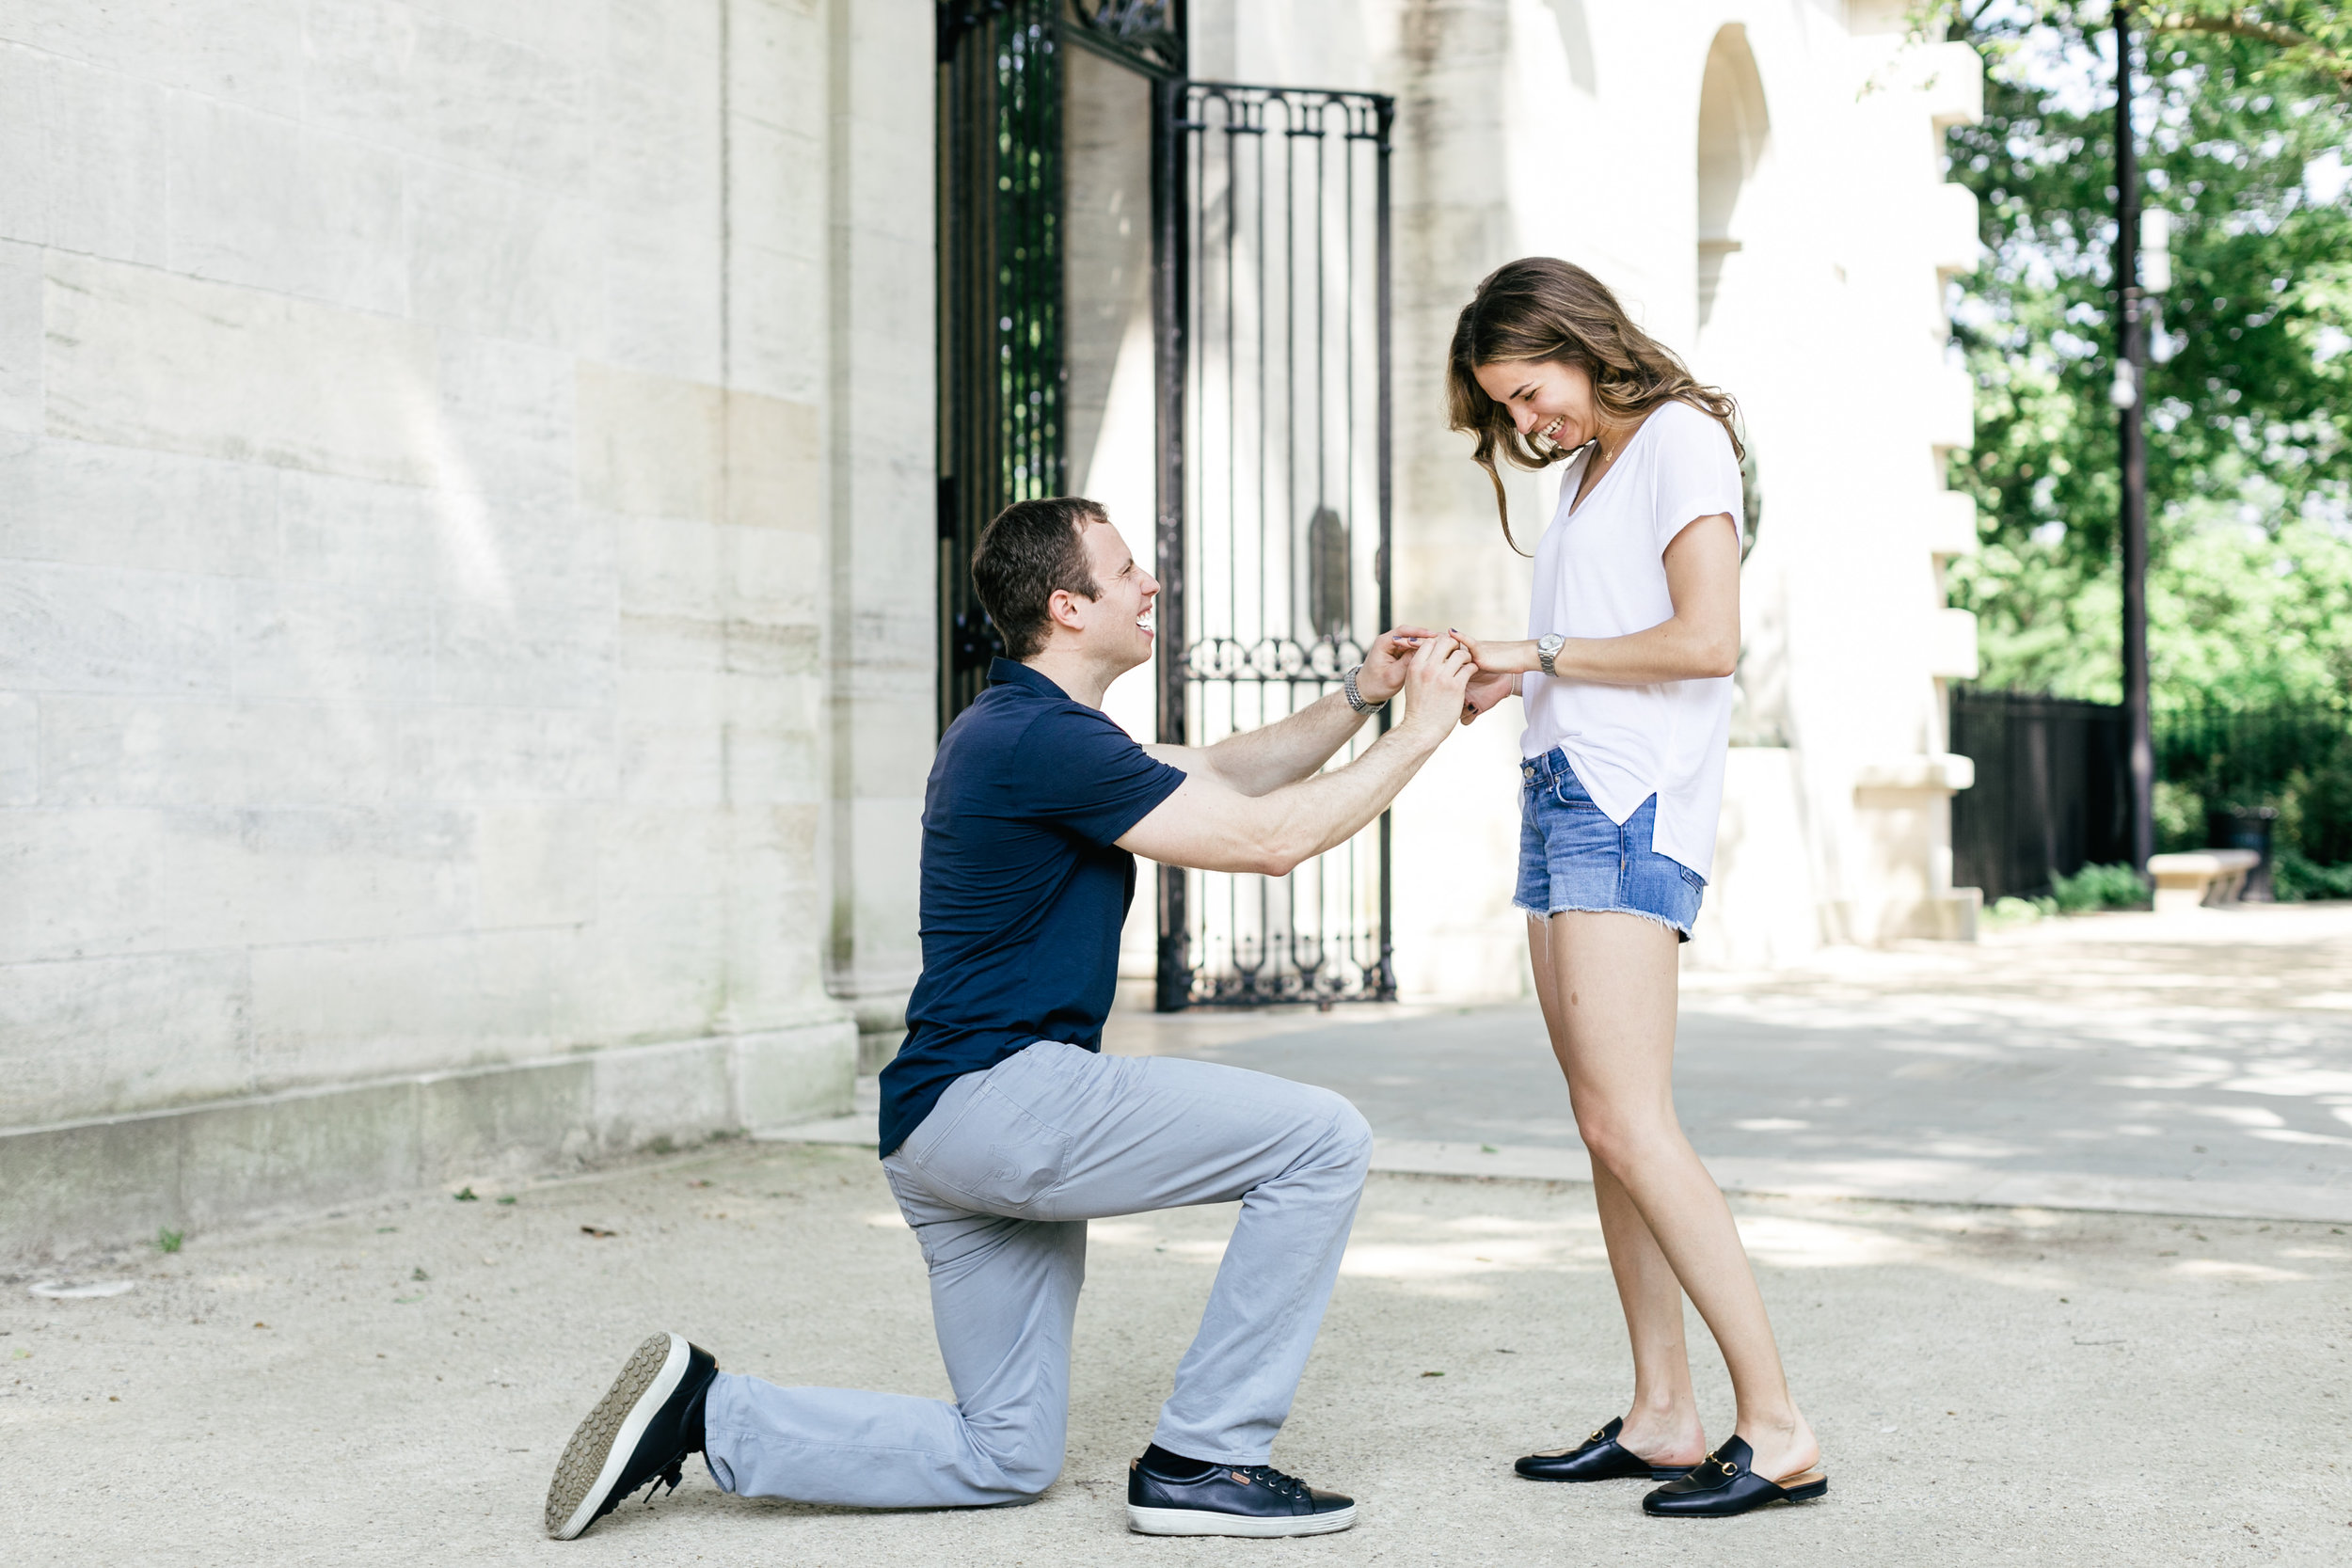 photography-natural-candid-engaged-proposal-philadelphia-wedding-rodin museum-barnes foundation-parkway-modern-lifestyle-03.JPG